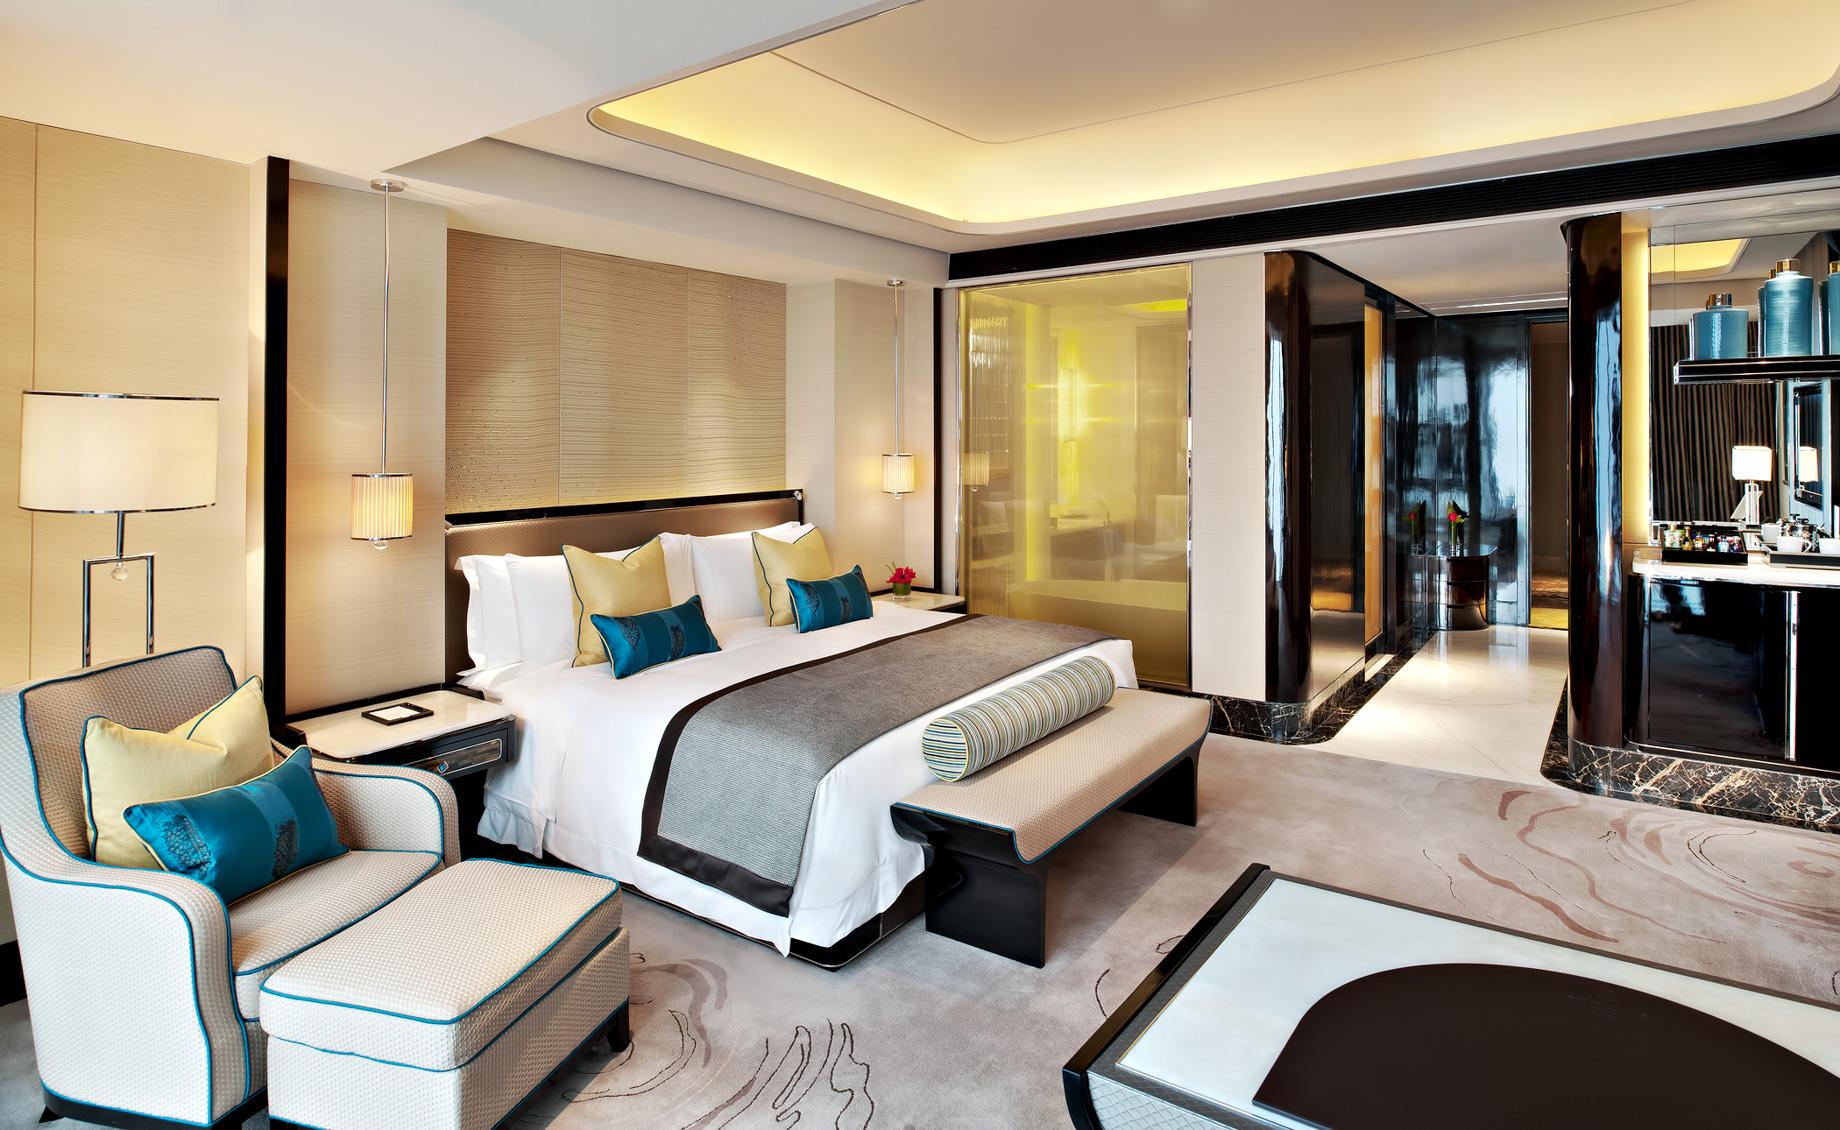 The St. Regis Shenzhen Luxury Hotel – Shenzhen, China – Deluxe City View Room